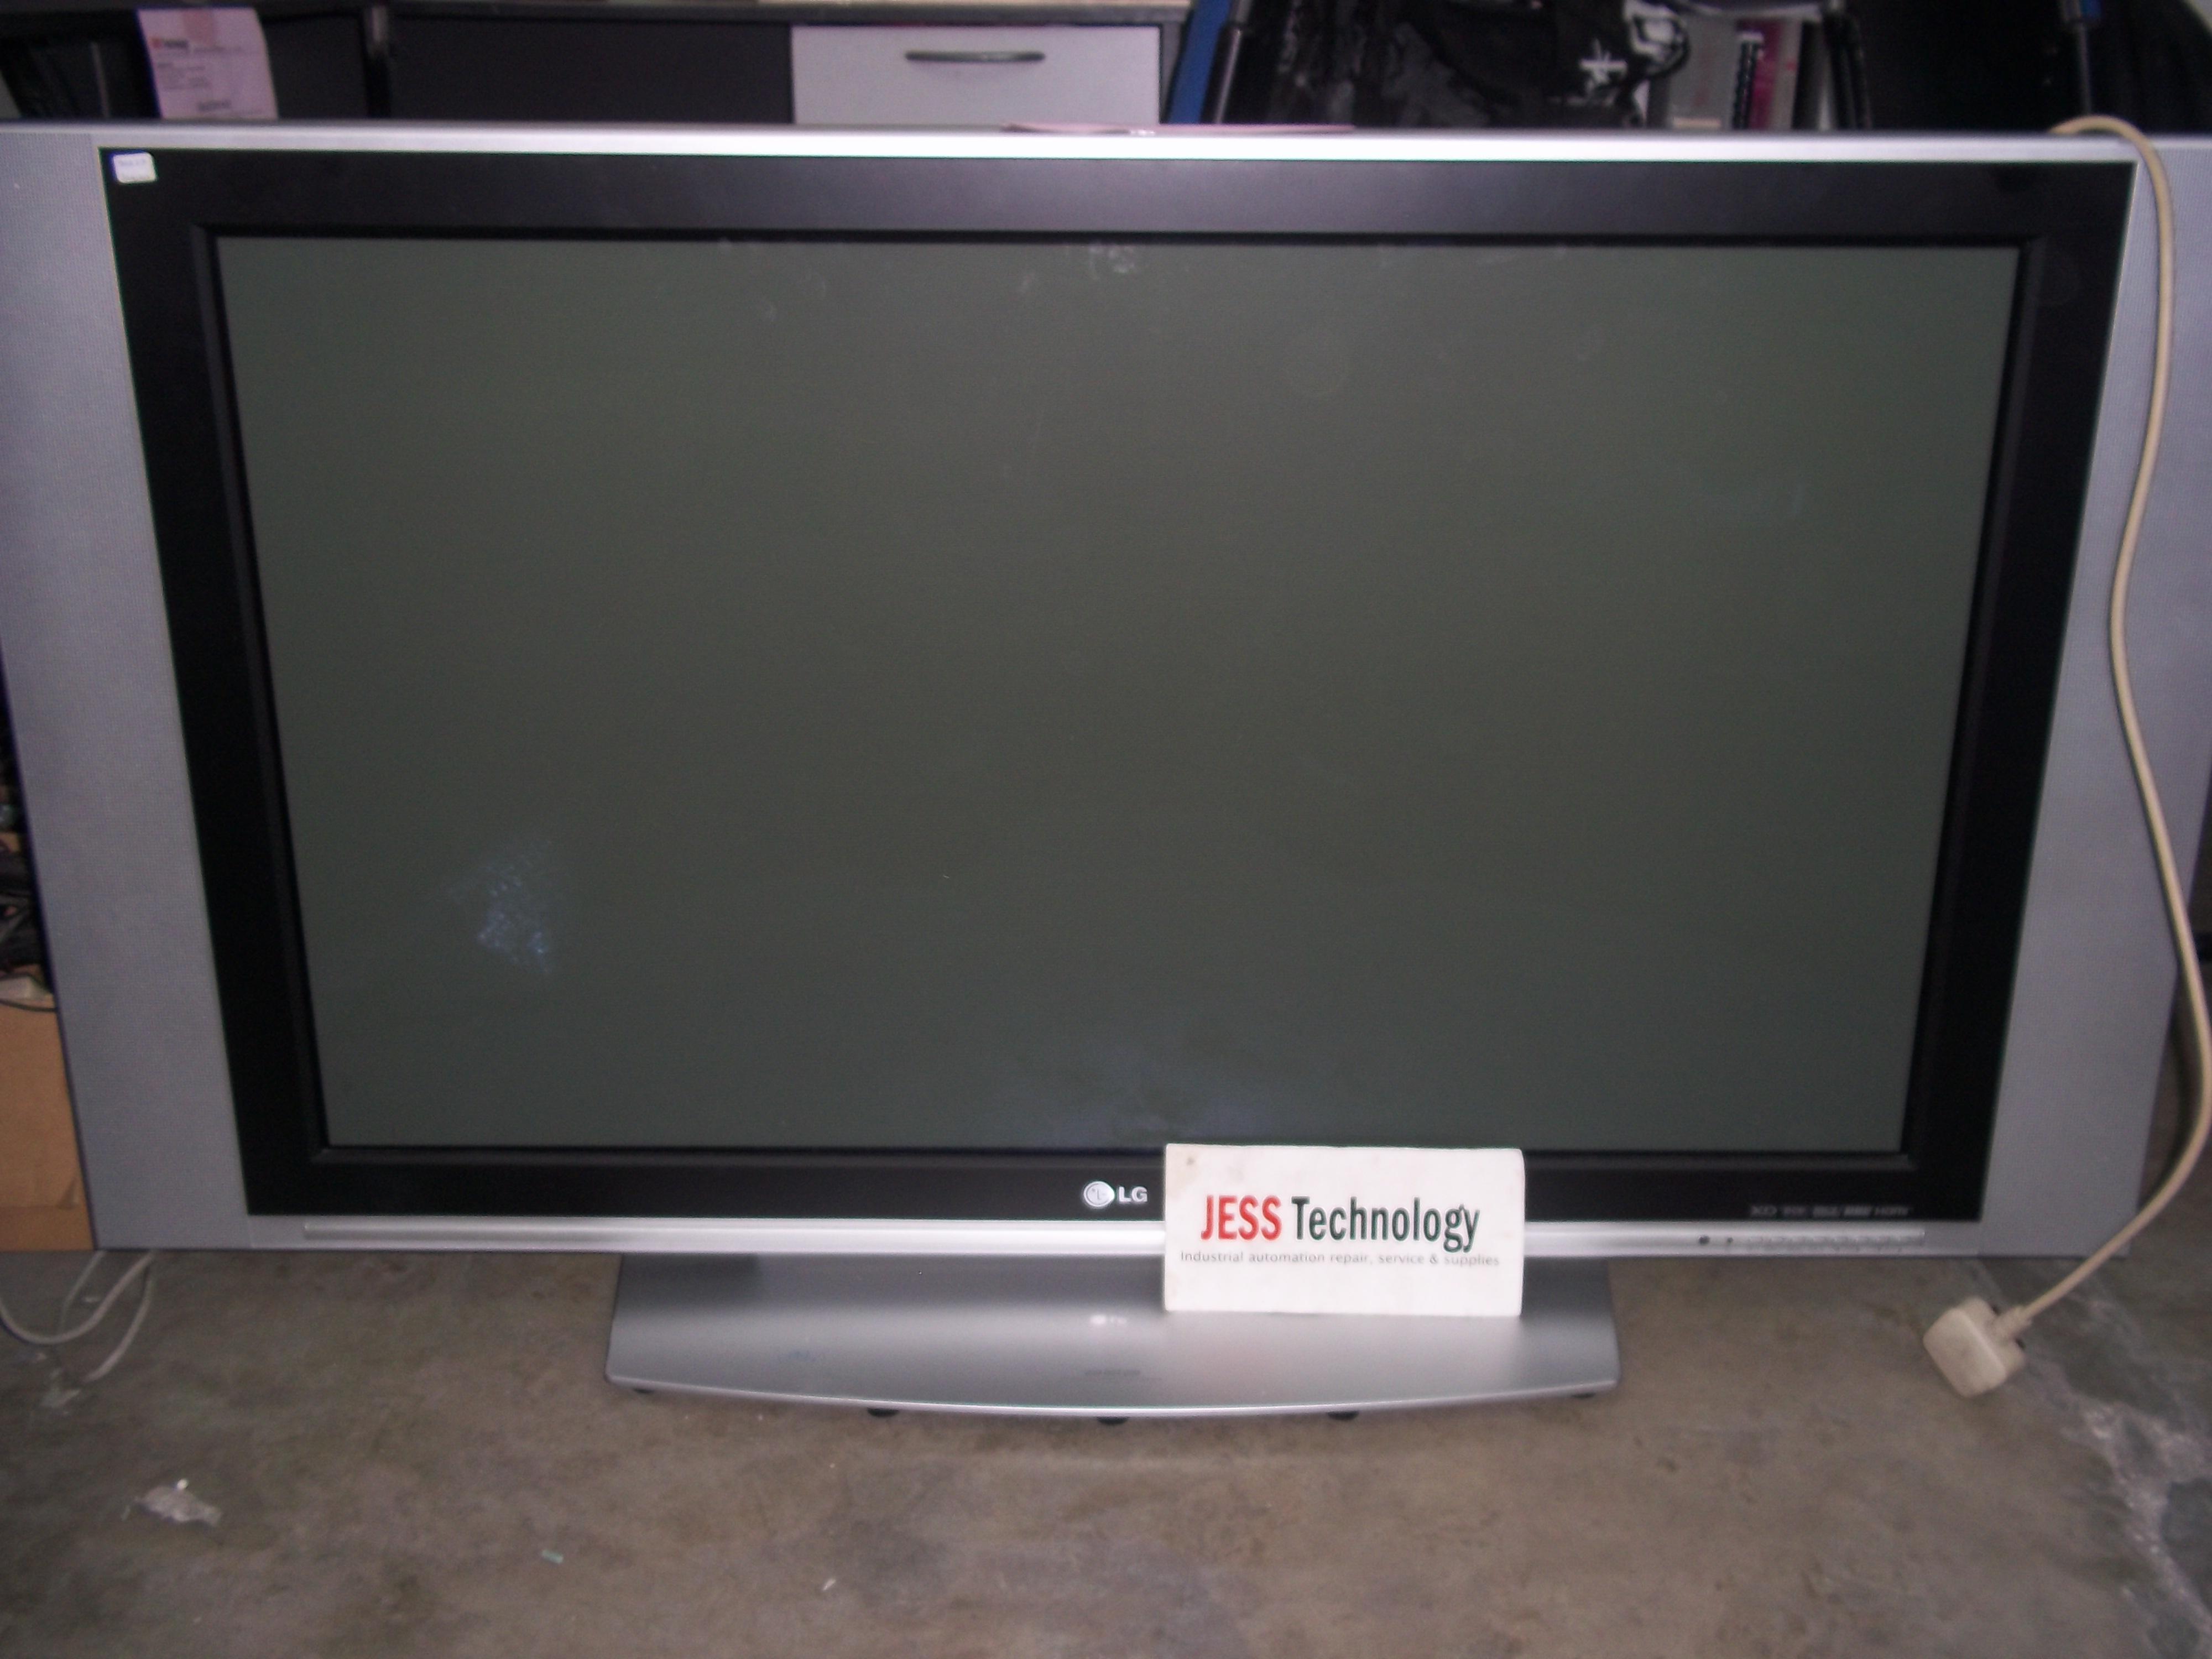 Repair 42PX3RV-TA LG LG TV 42PX3RV-TA in Malaysia, Singapore, Thailand, Indonesia